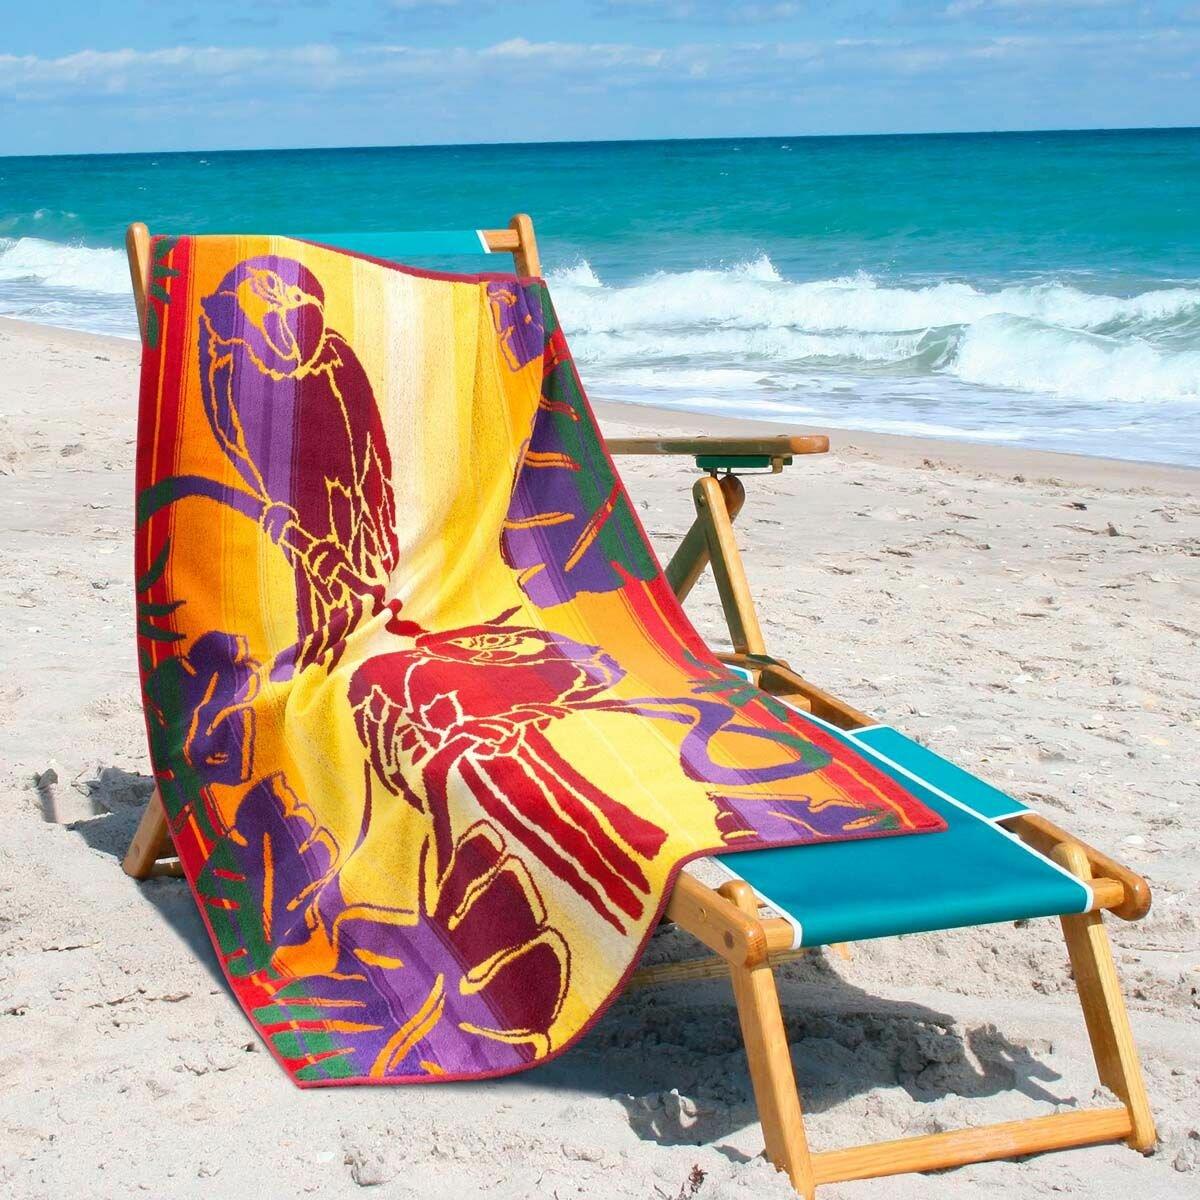 Полотенце для пляжа Guten Morgen / Гутен Морген Полотенце пляжное Guten Morgen